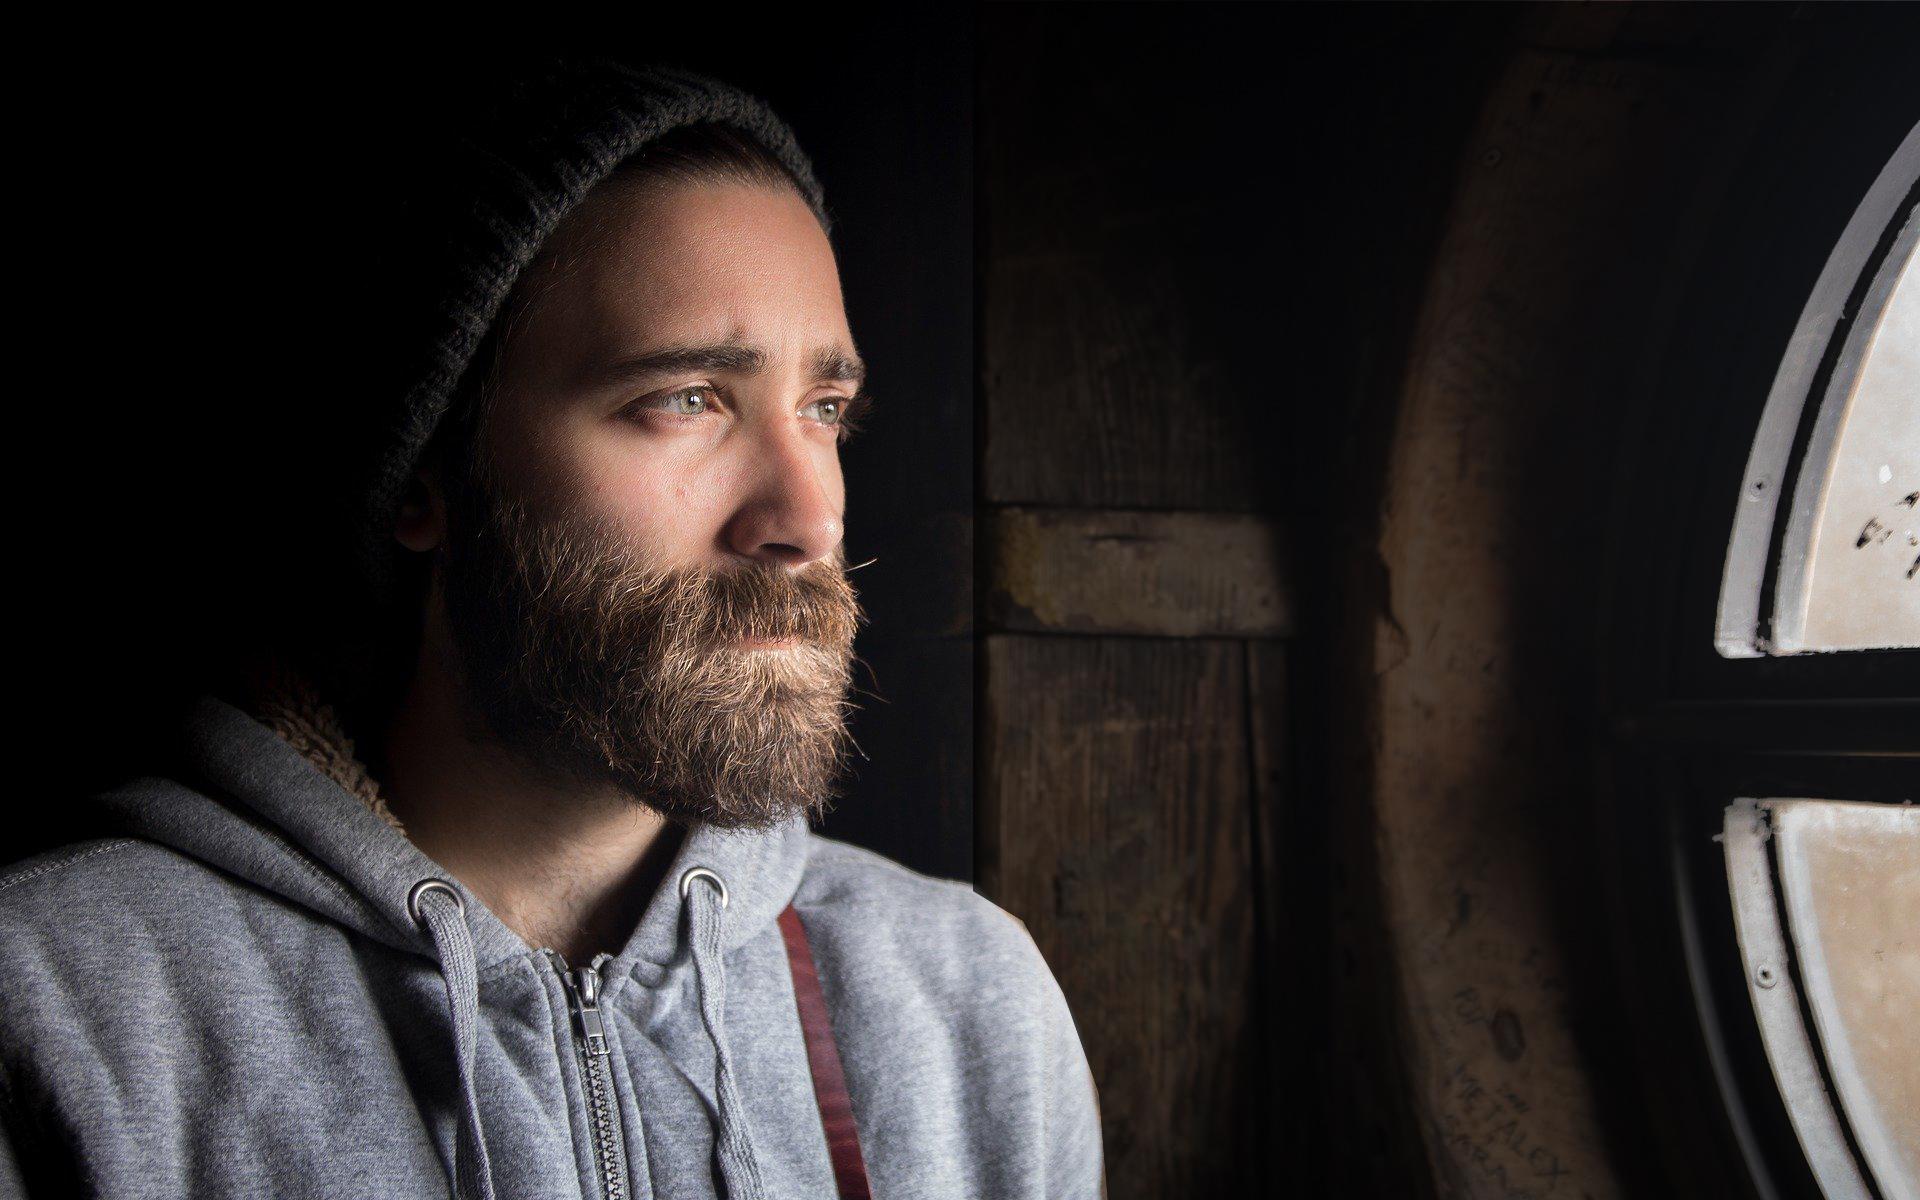 uomo con barba coronavirus